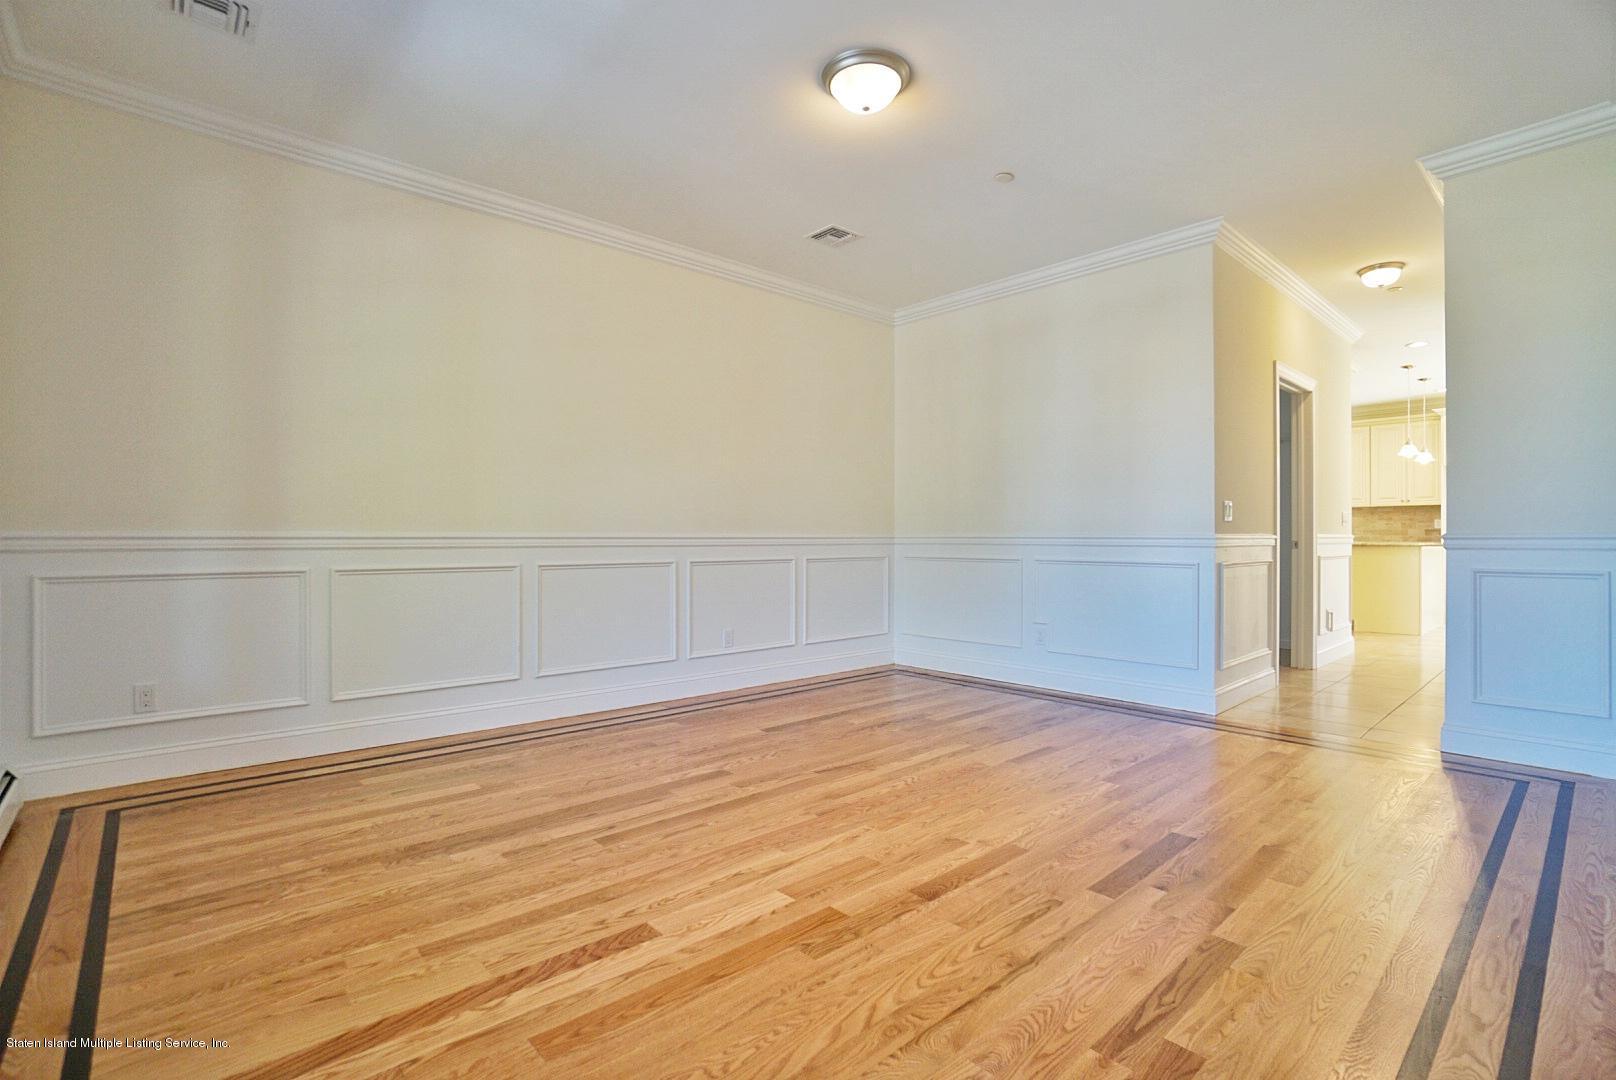 Single Family - Detached 678 Yetman Avenue  Staten Island, NY 10307, MLS-1132766-12